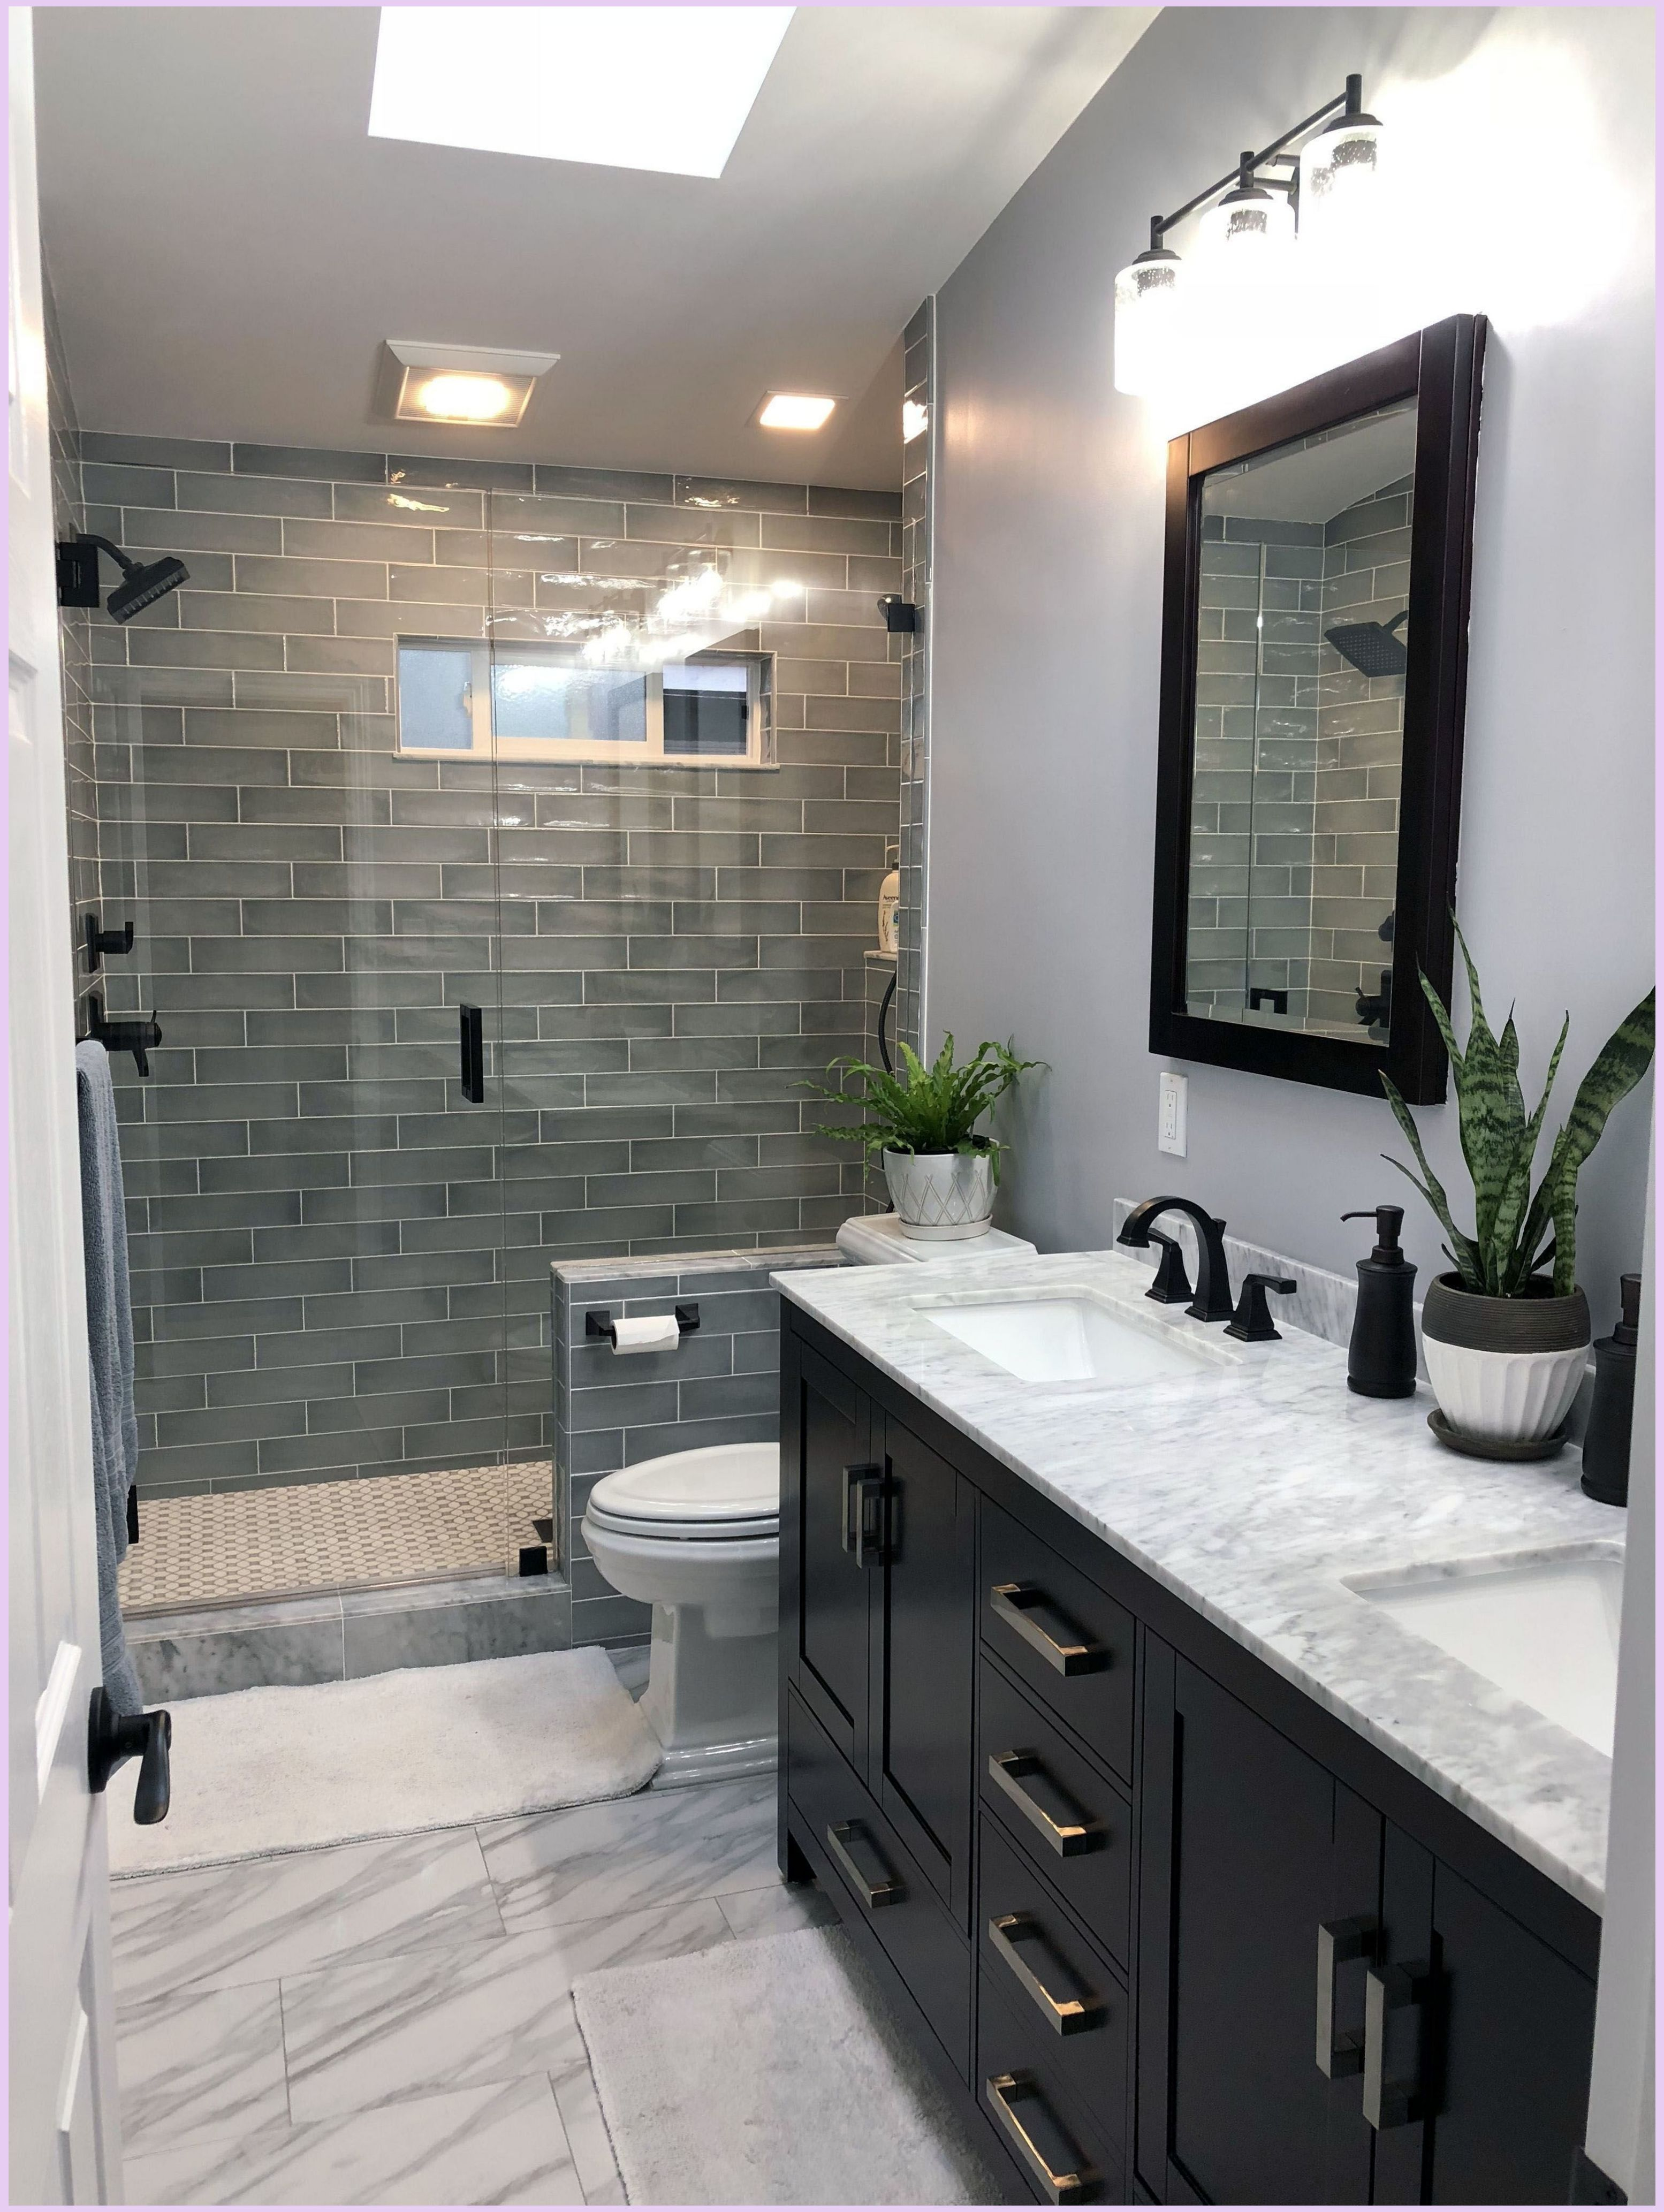 47 Best Master Bathroom Remodeling On A Budget Ideas 28 Master Bathroom Ideas On A Budget In 2020 Bathroom Tile Designs Bathroom Remodel Master Bathrooms Remodel